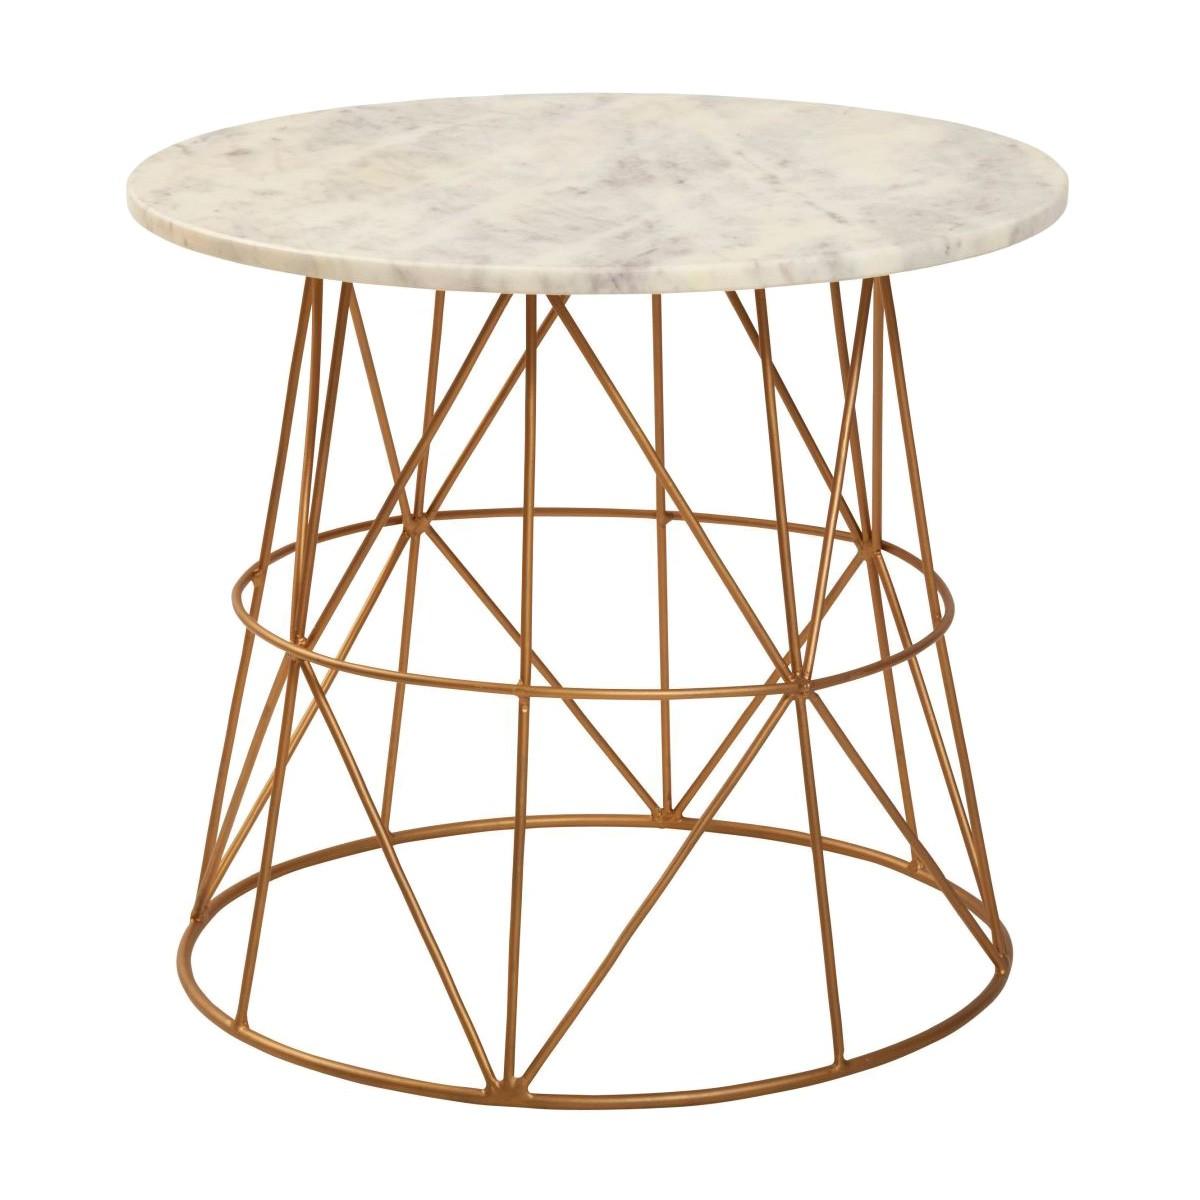 Klein Marble Topped Iron Round Side Table